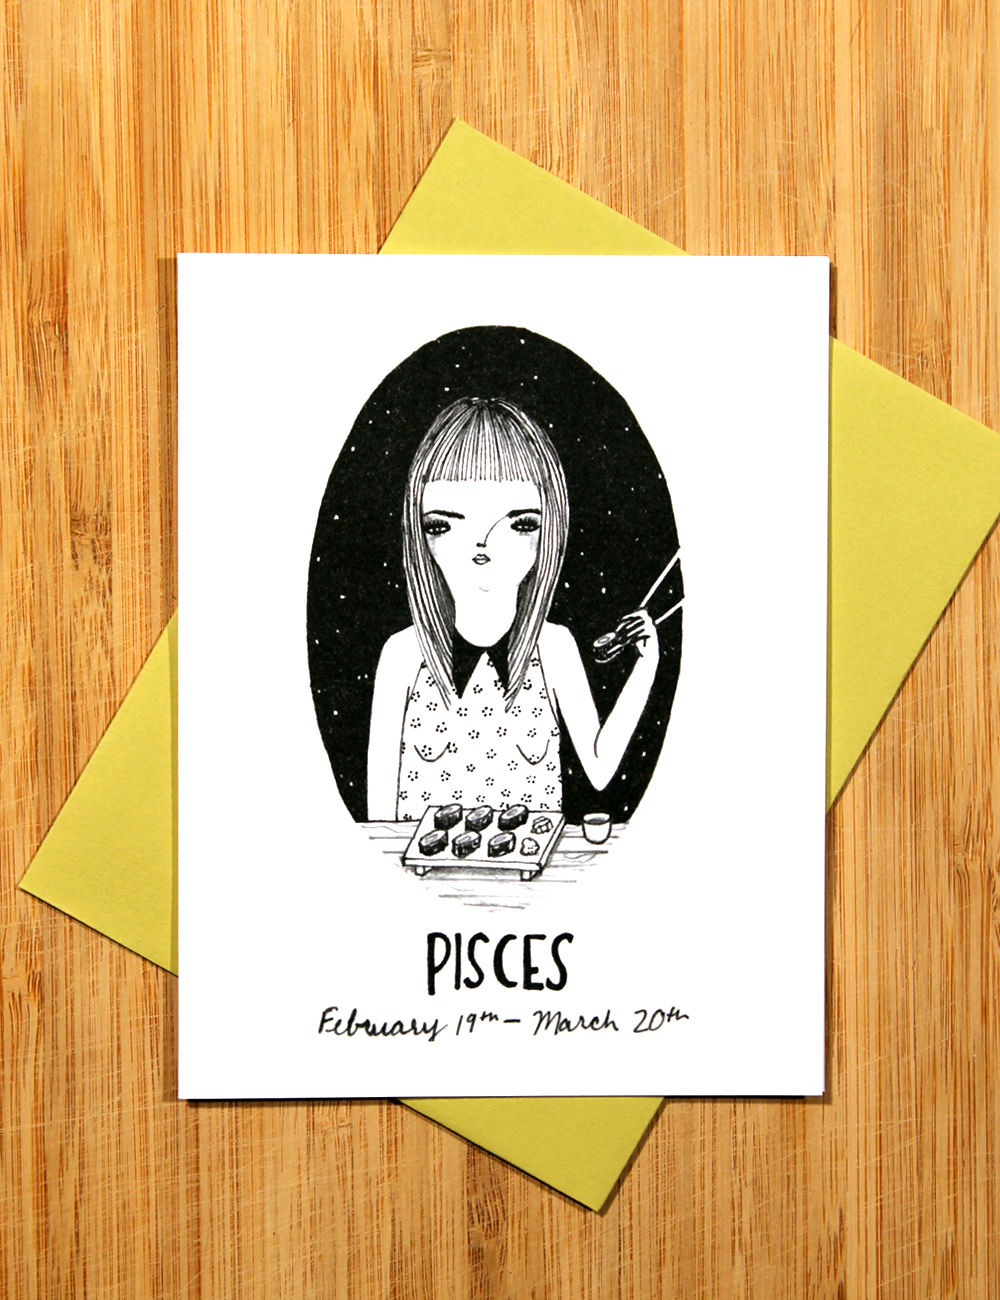 Piscescard.jpg